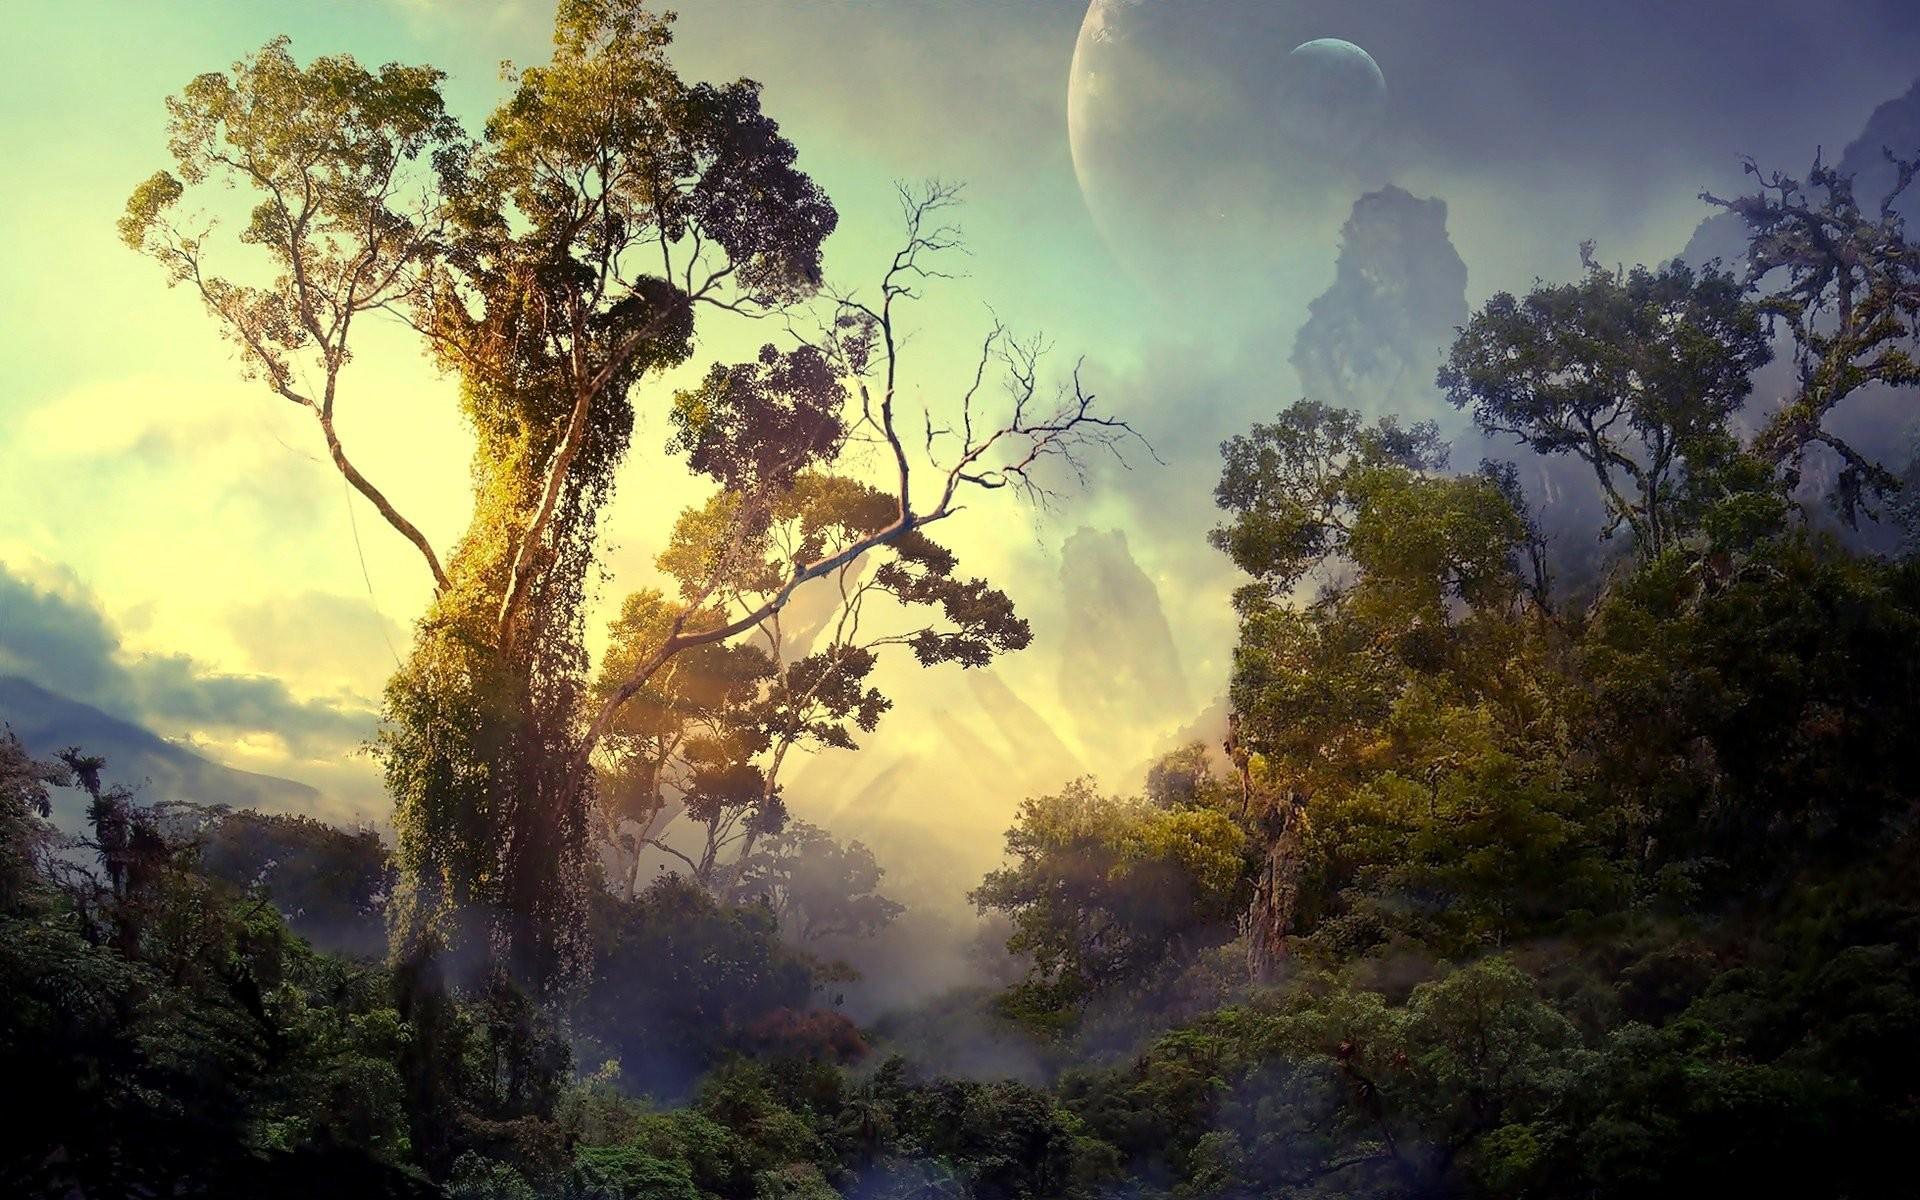 Rainforest Wallpapers Full HD wallpaper search Rainforrest | wallpapers |  Pinterest | Wallpaper